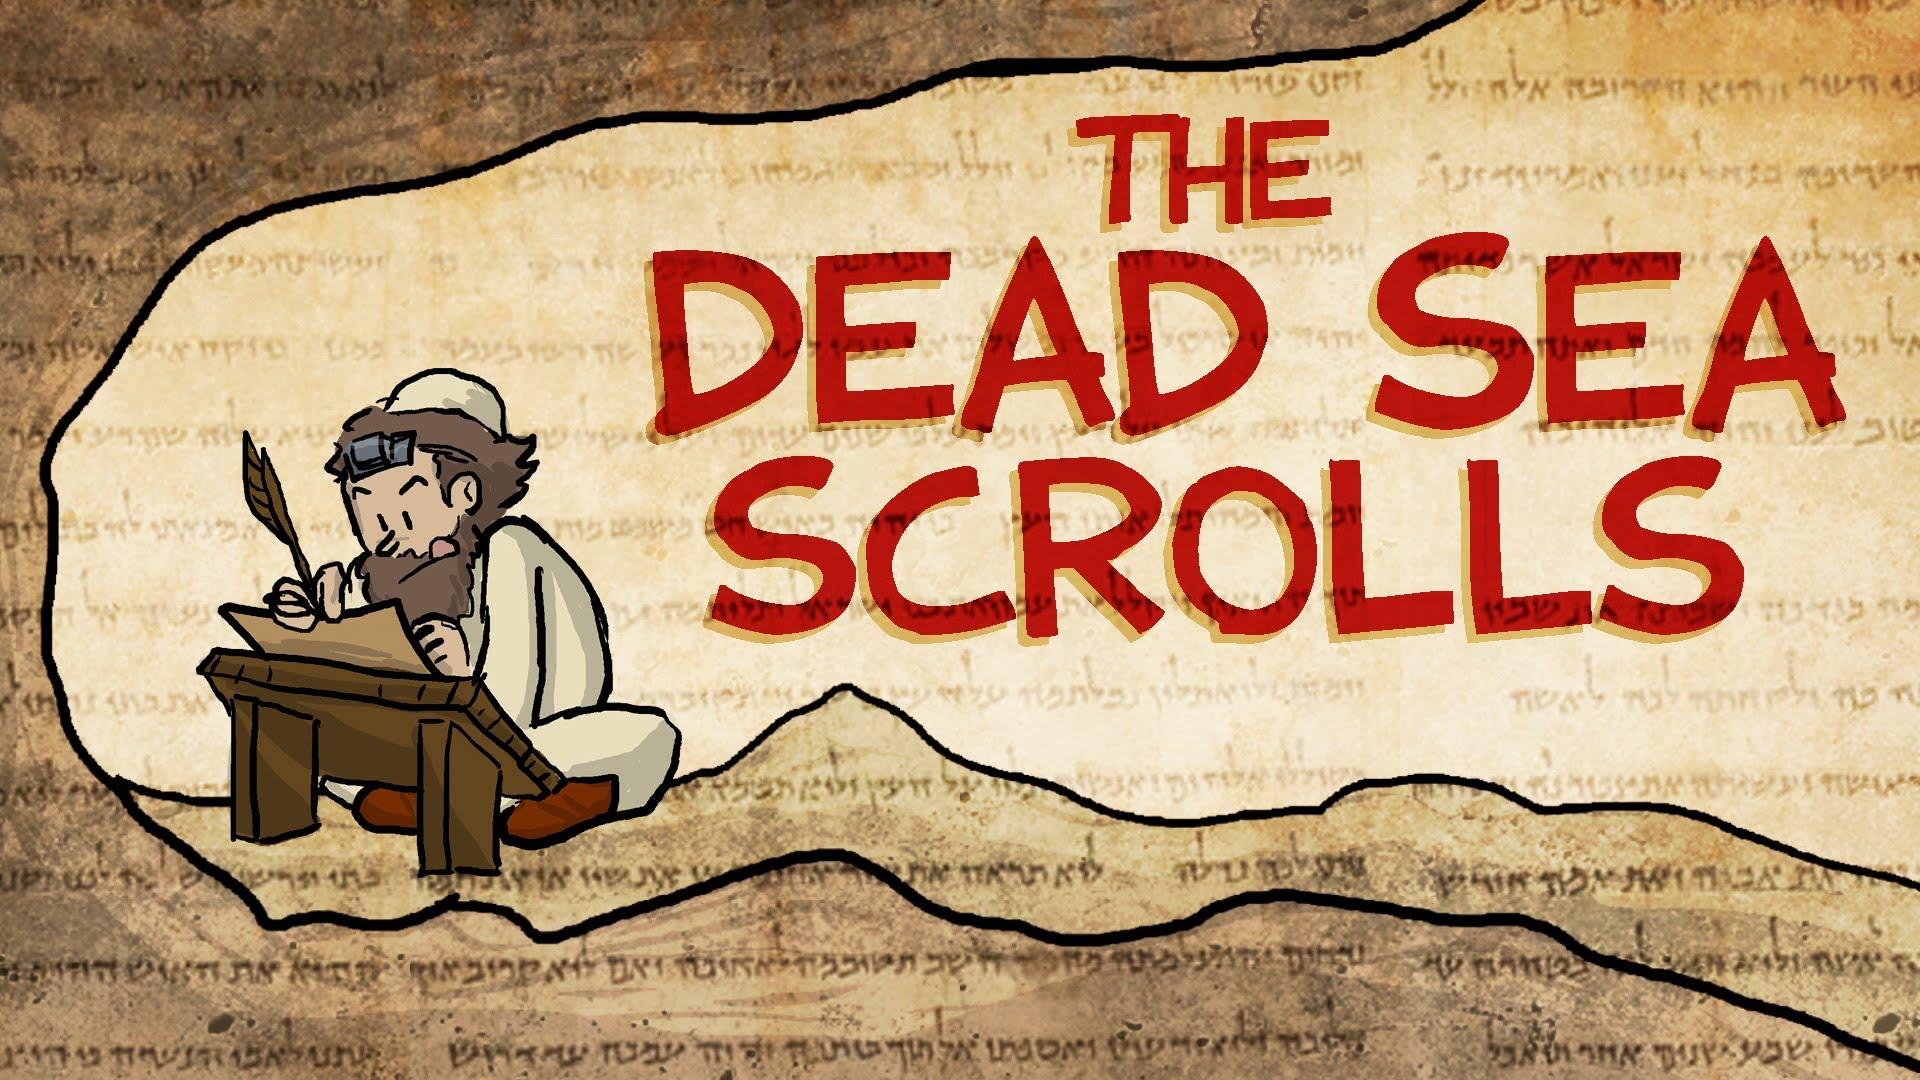 The Dead Sea Scrolls.